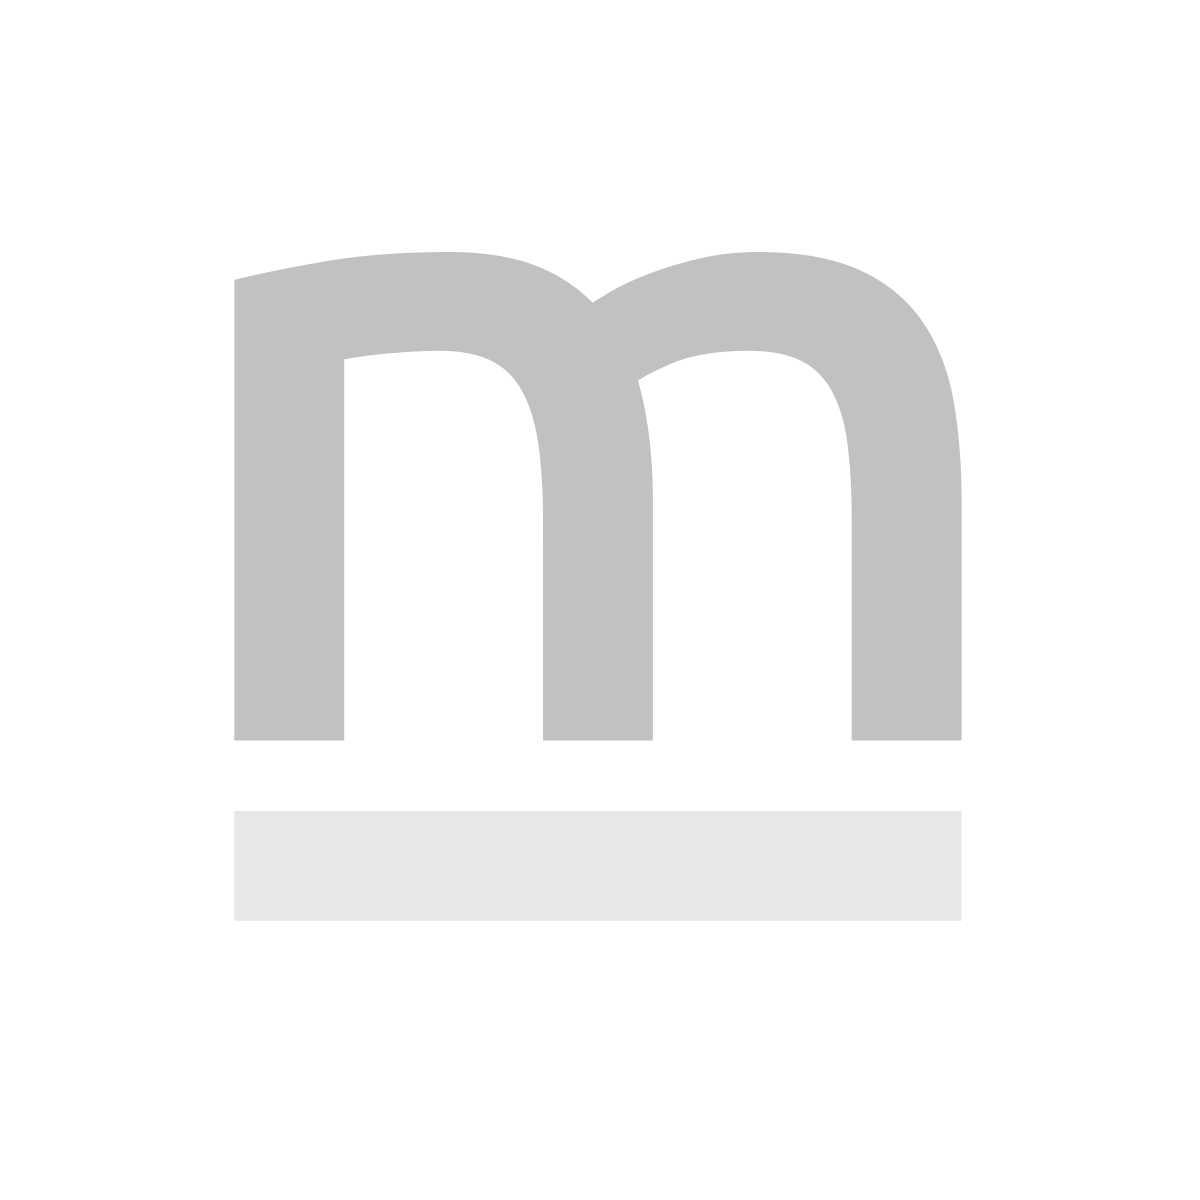 Pokrowiec na materac PIXEL 160x200